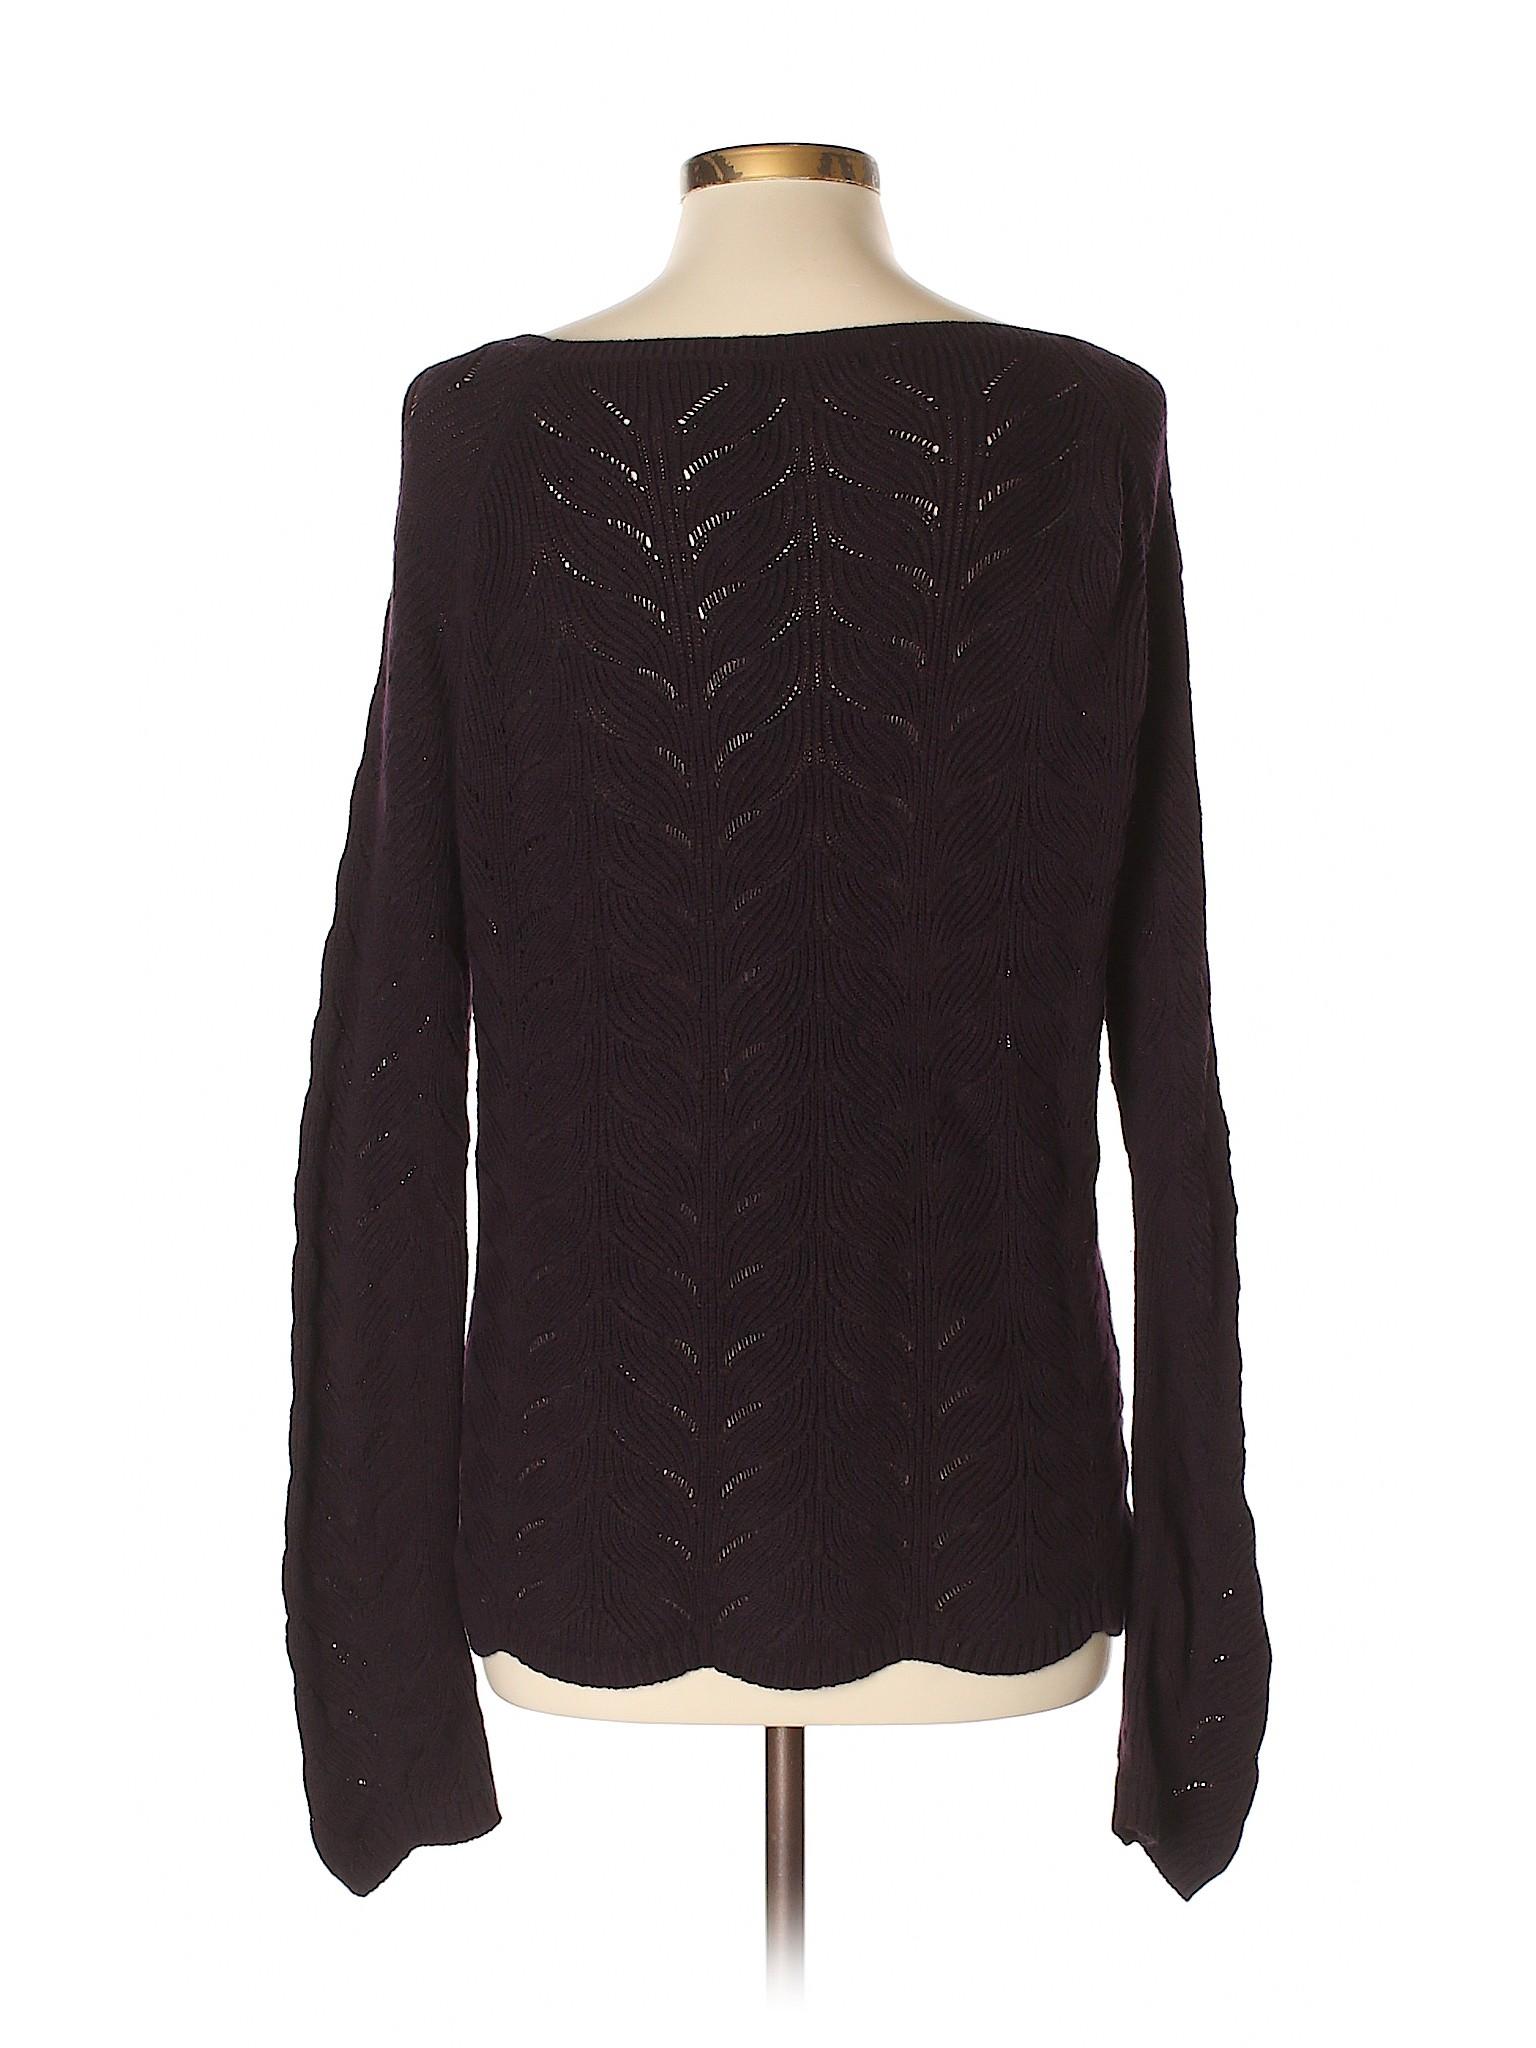 Sweater for Collection Republic Boutique Pullover Marimekko winter Banana qt0txOvF